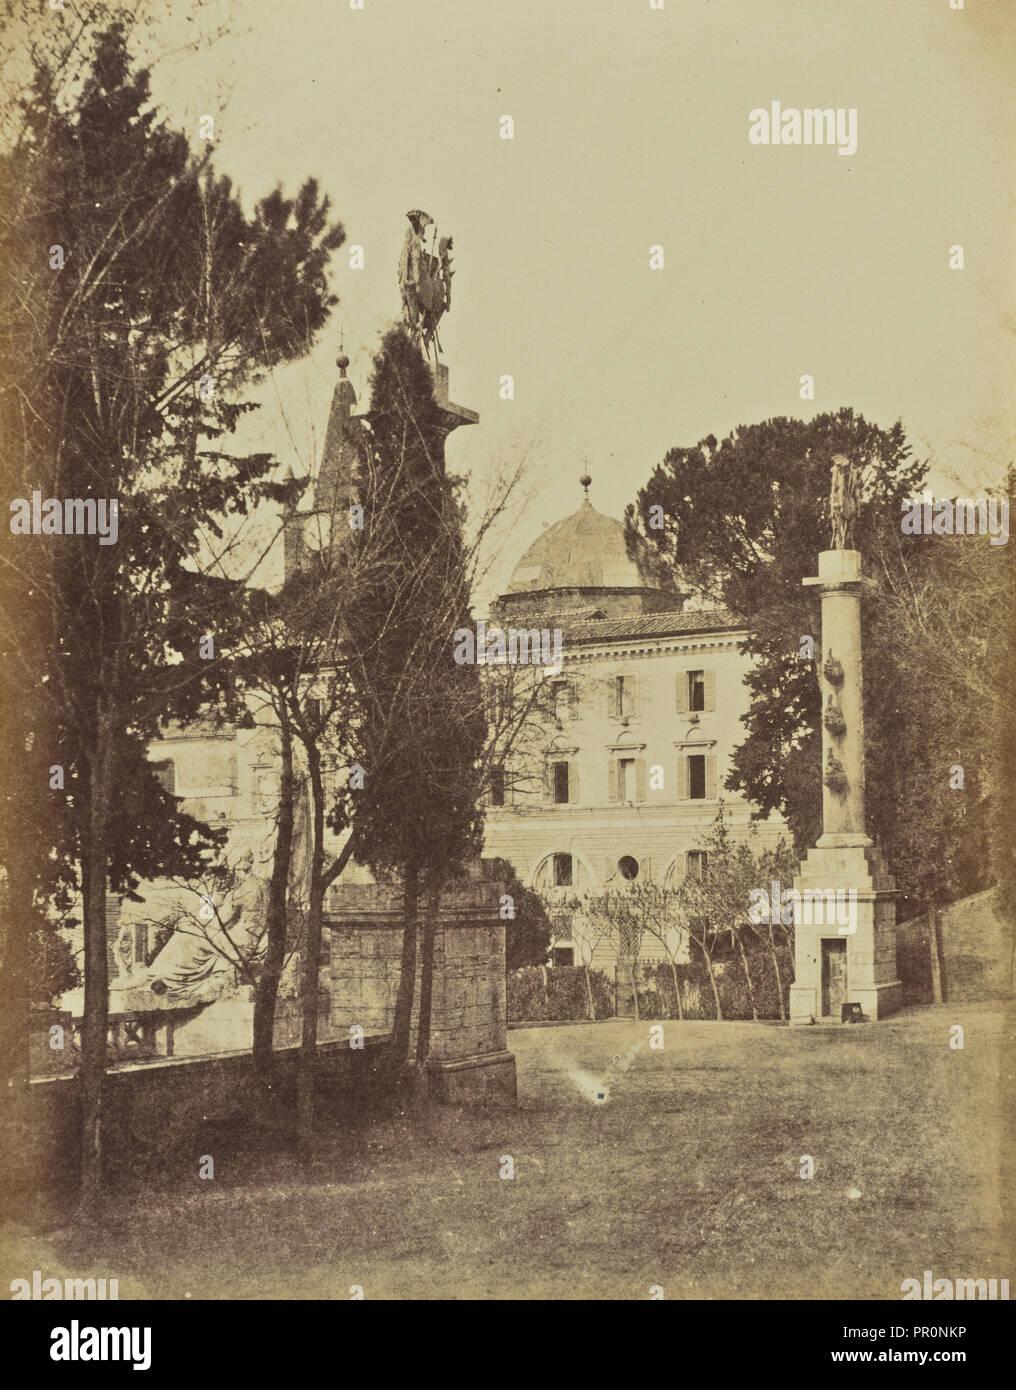 Ascent to Monte Pincio, Rome; Mrs. Jane St. John, British, 1803 - 1882, Rome, Italy; 1856 - 1859; Albumen silver print - Stock Image